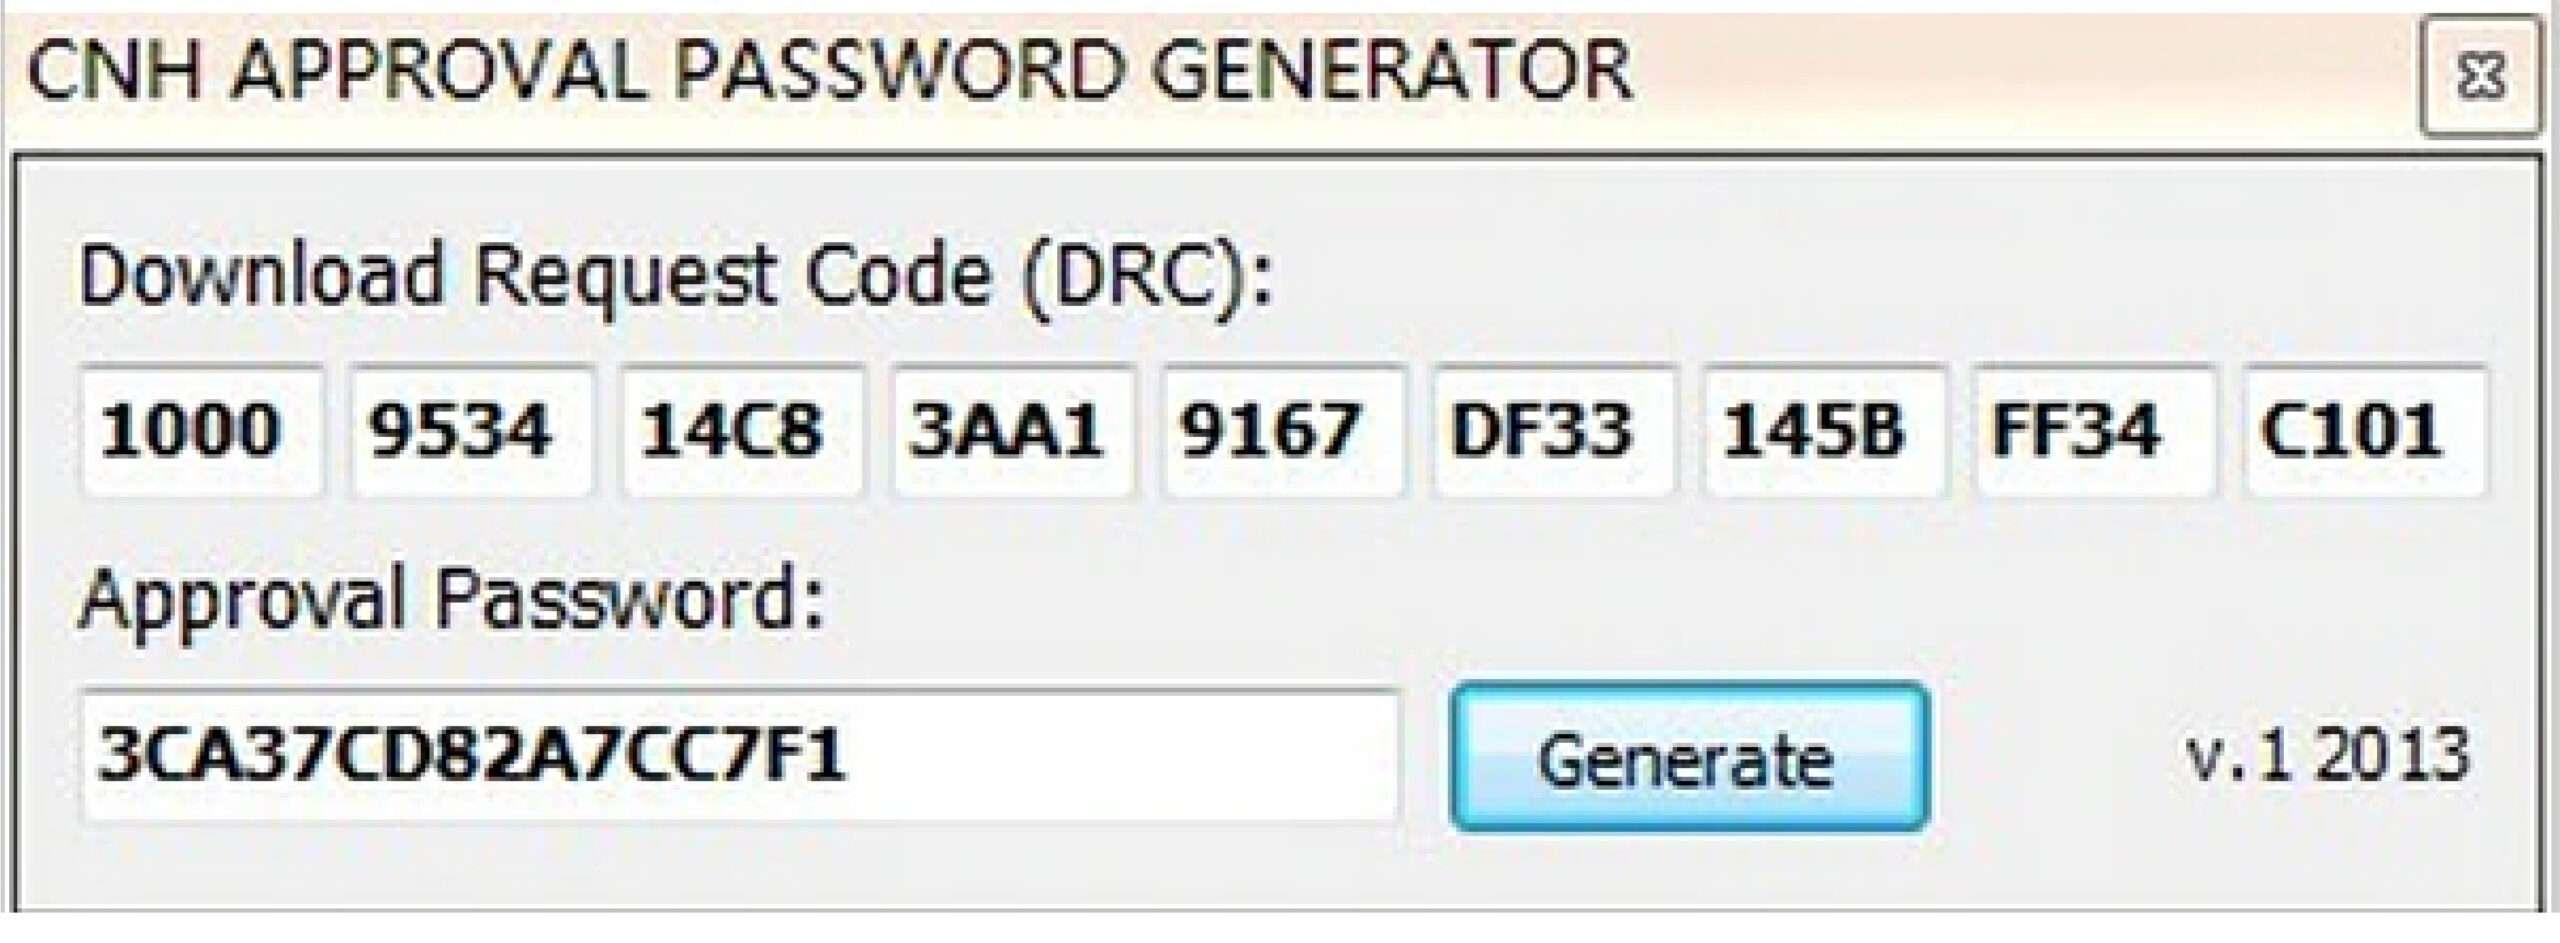 Case CNH EST Approval Password Generator SS-01